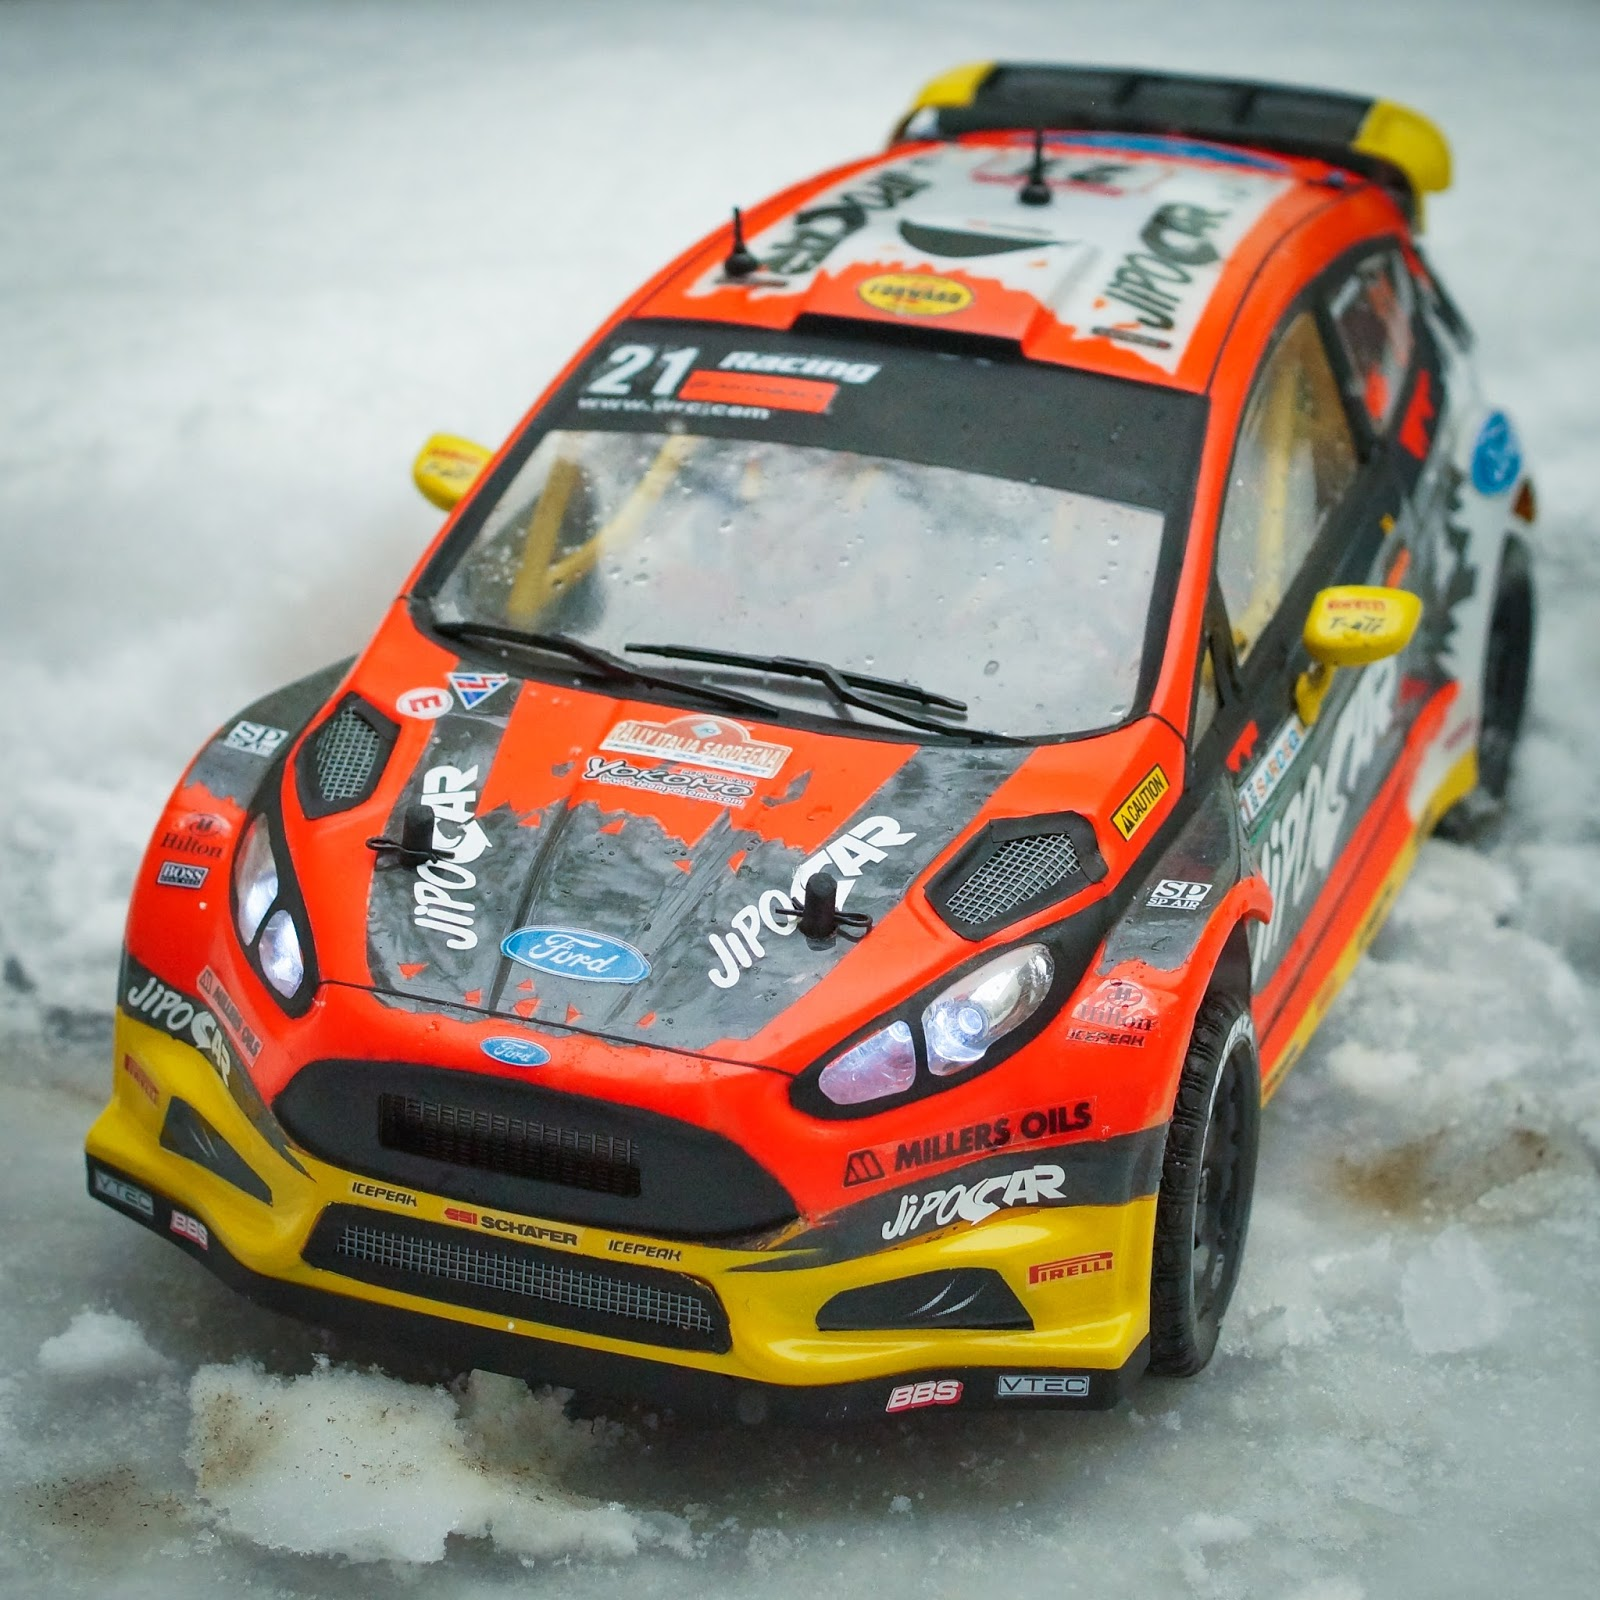 TEAM YOKOMO ITALIAN BLOG: 1/10 RC JIPOCAR FIESTA RS WRC REPLICA BODY